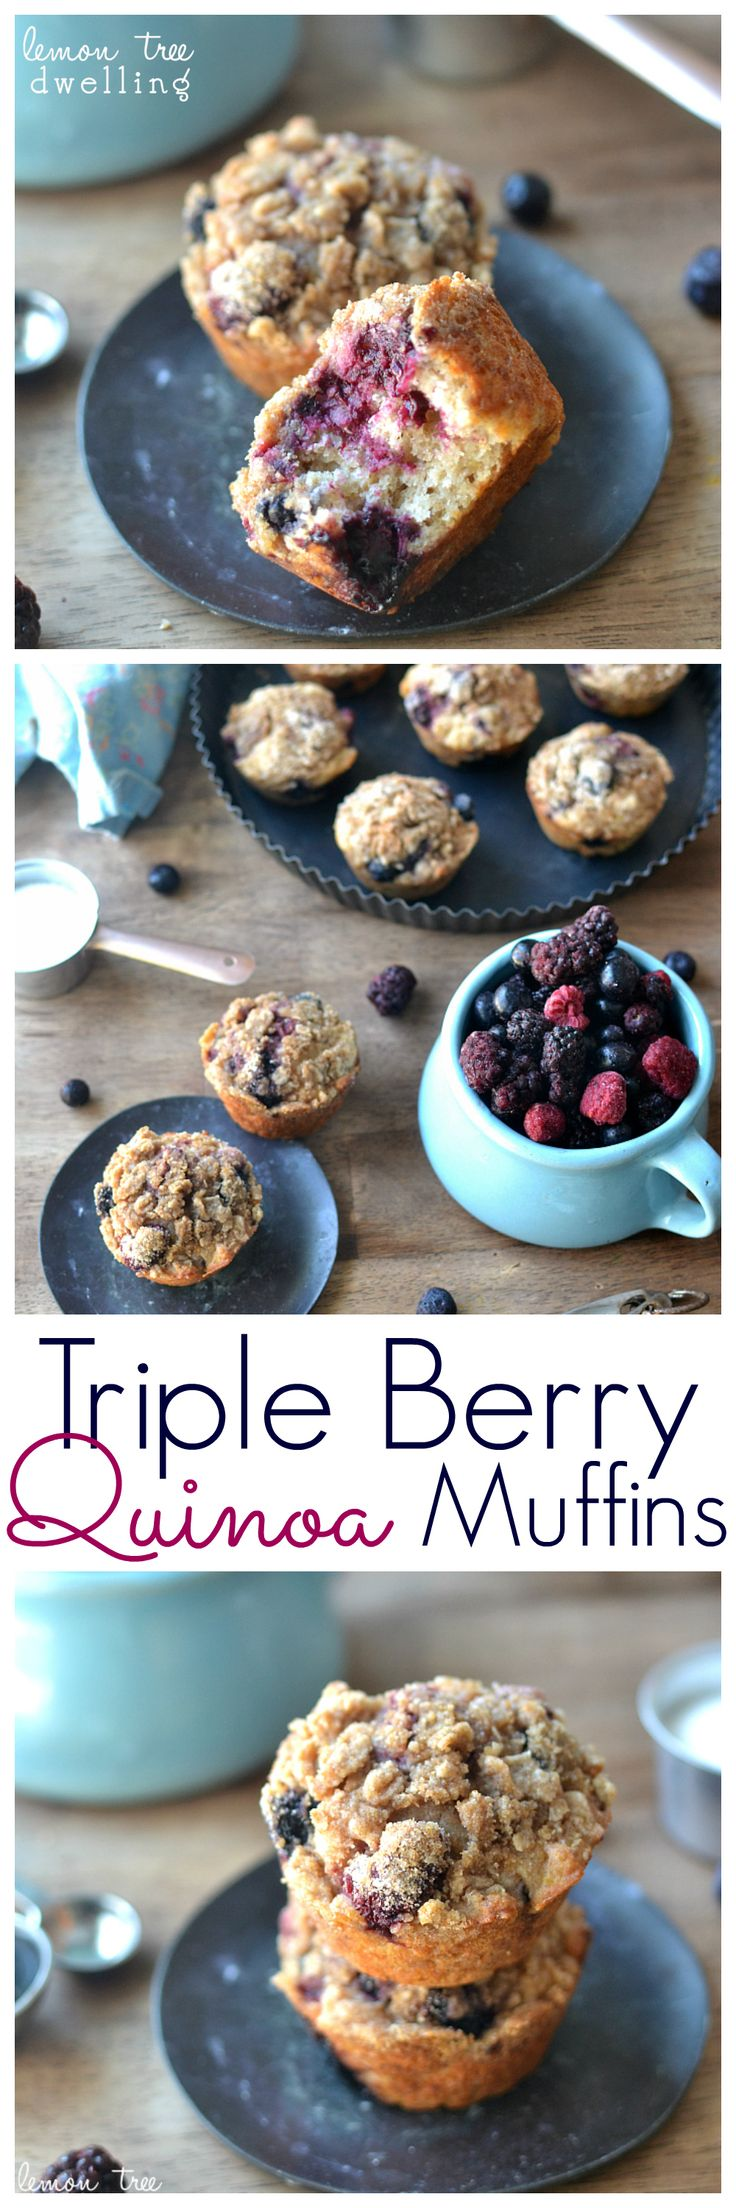 Triple Berry Quinoa Muffins | Lemon Tree Dwelling